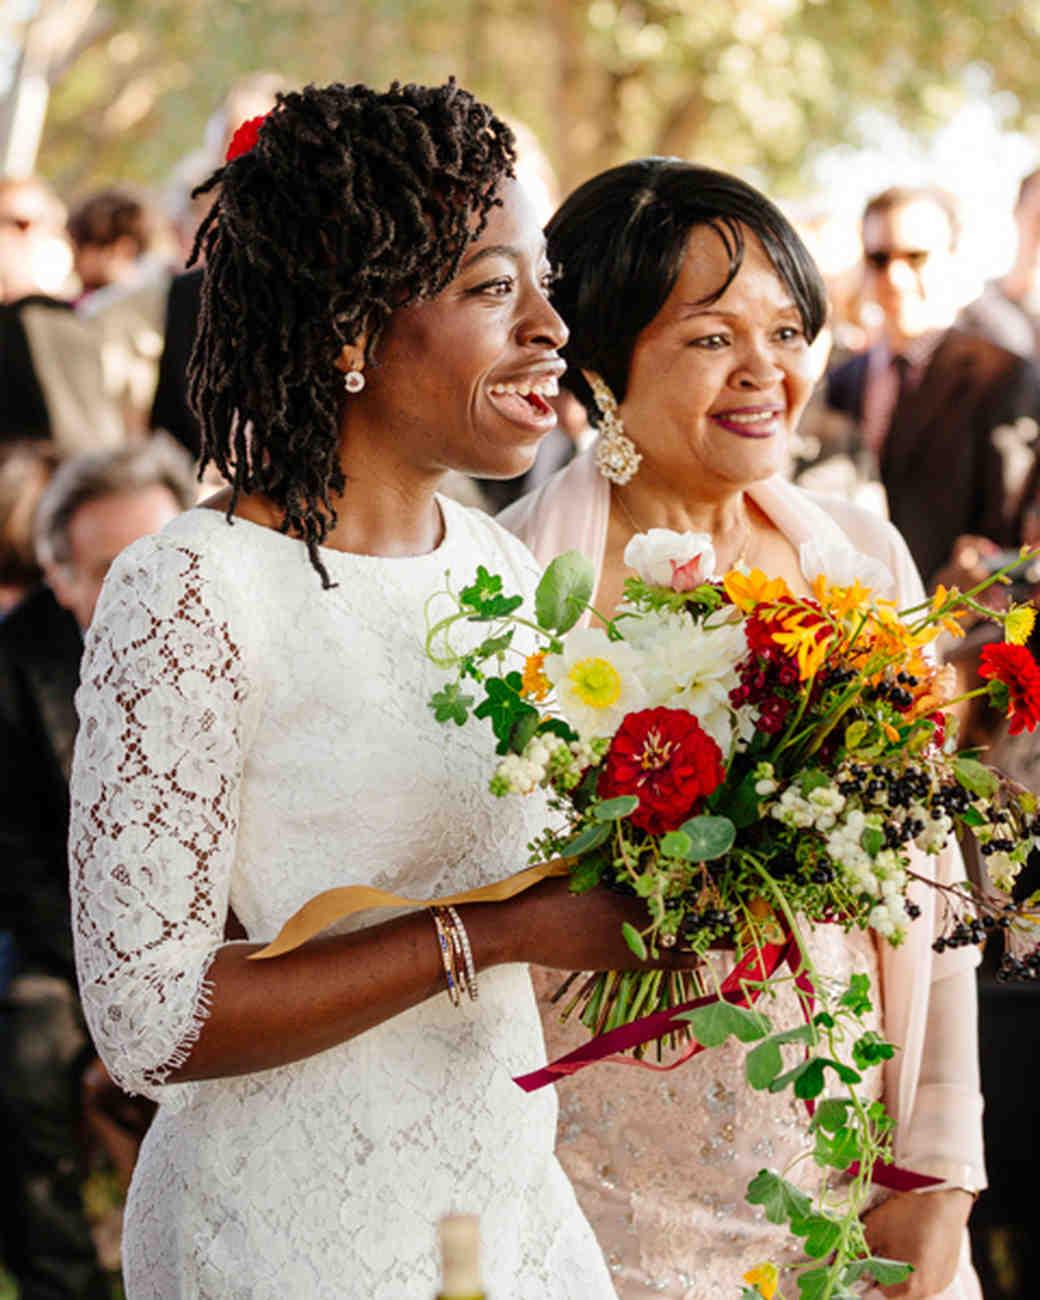 erica-jordy-wedding-processional-2602-s111971-0715.jpg